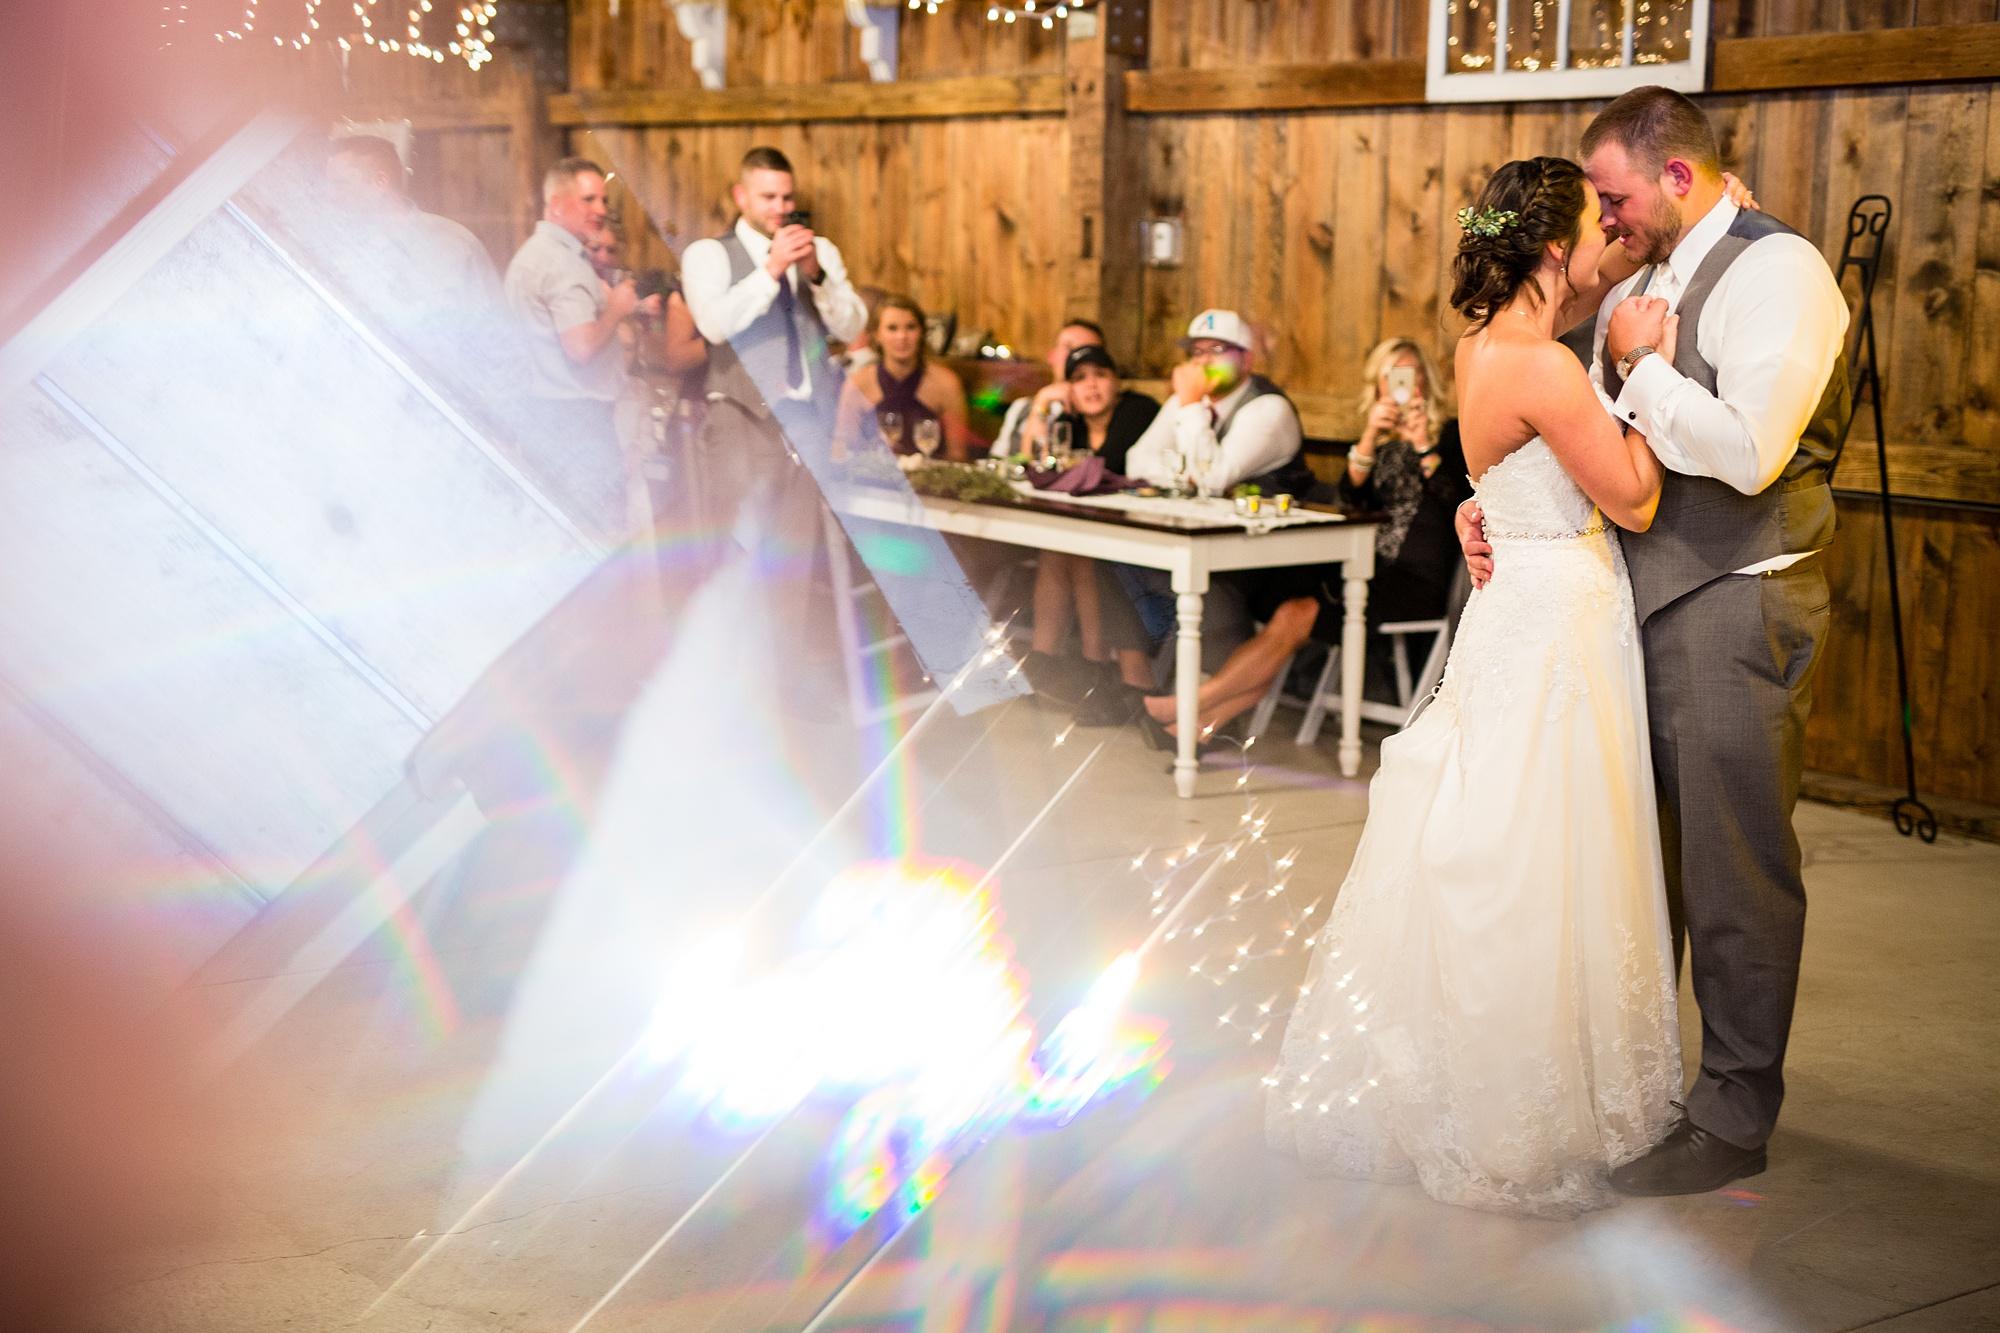 Brandon_Shafer_Photography_Emily_Travis_Kalamazoo_Wedding_Photography_0052.jpg